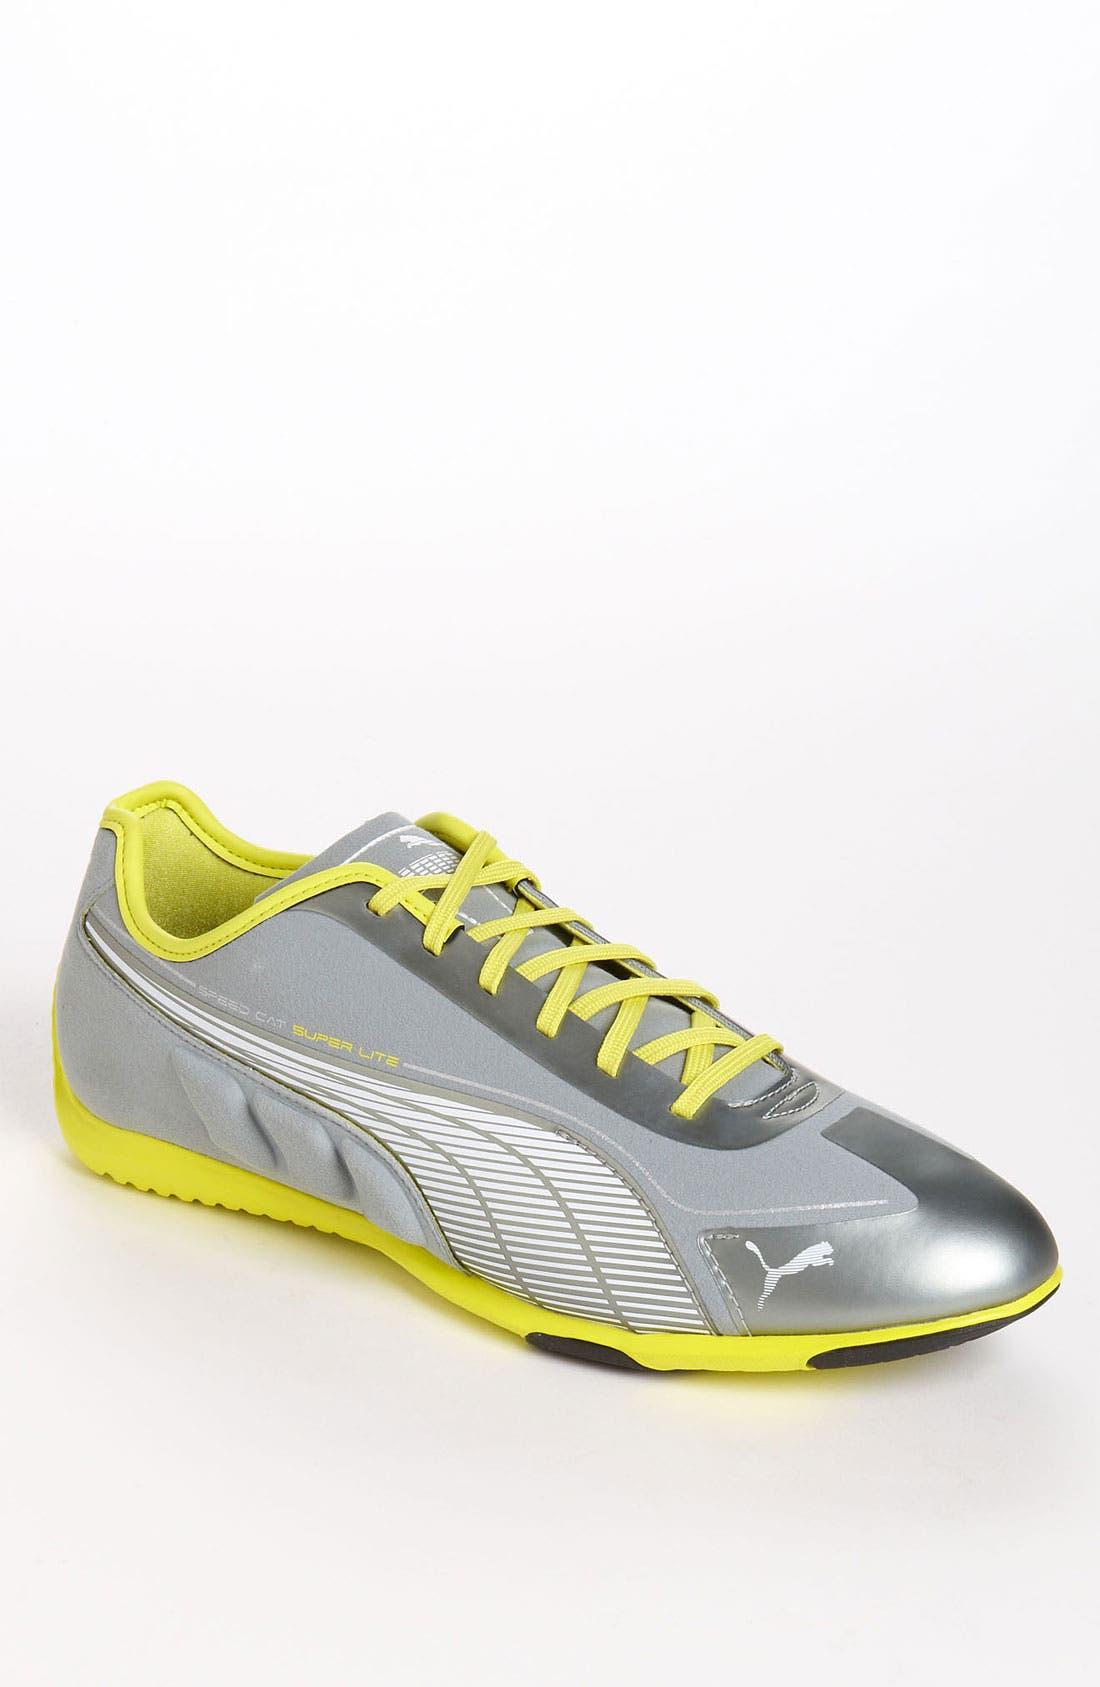 Alternate Image 1 Selected - PUMA 'Speed Cat Super Lite' Sneaker (Men)